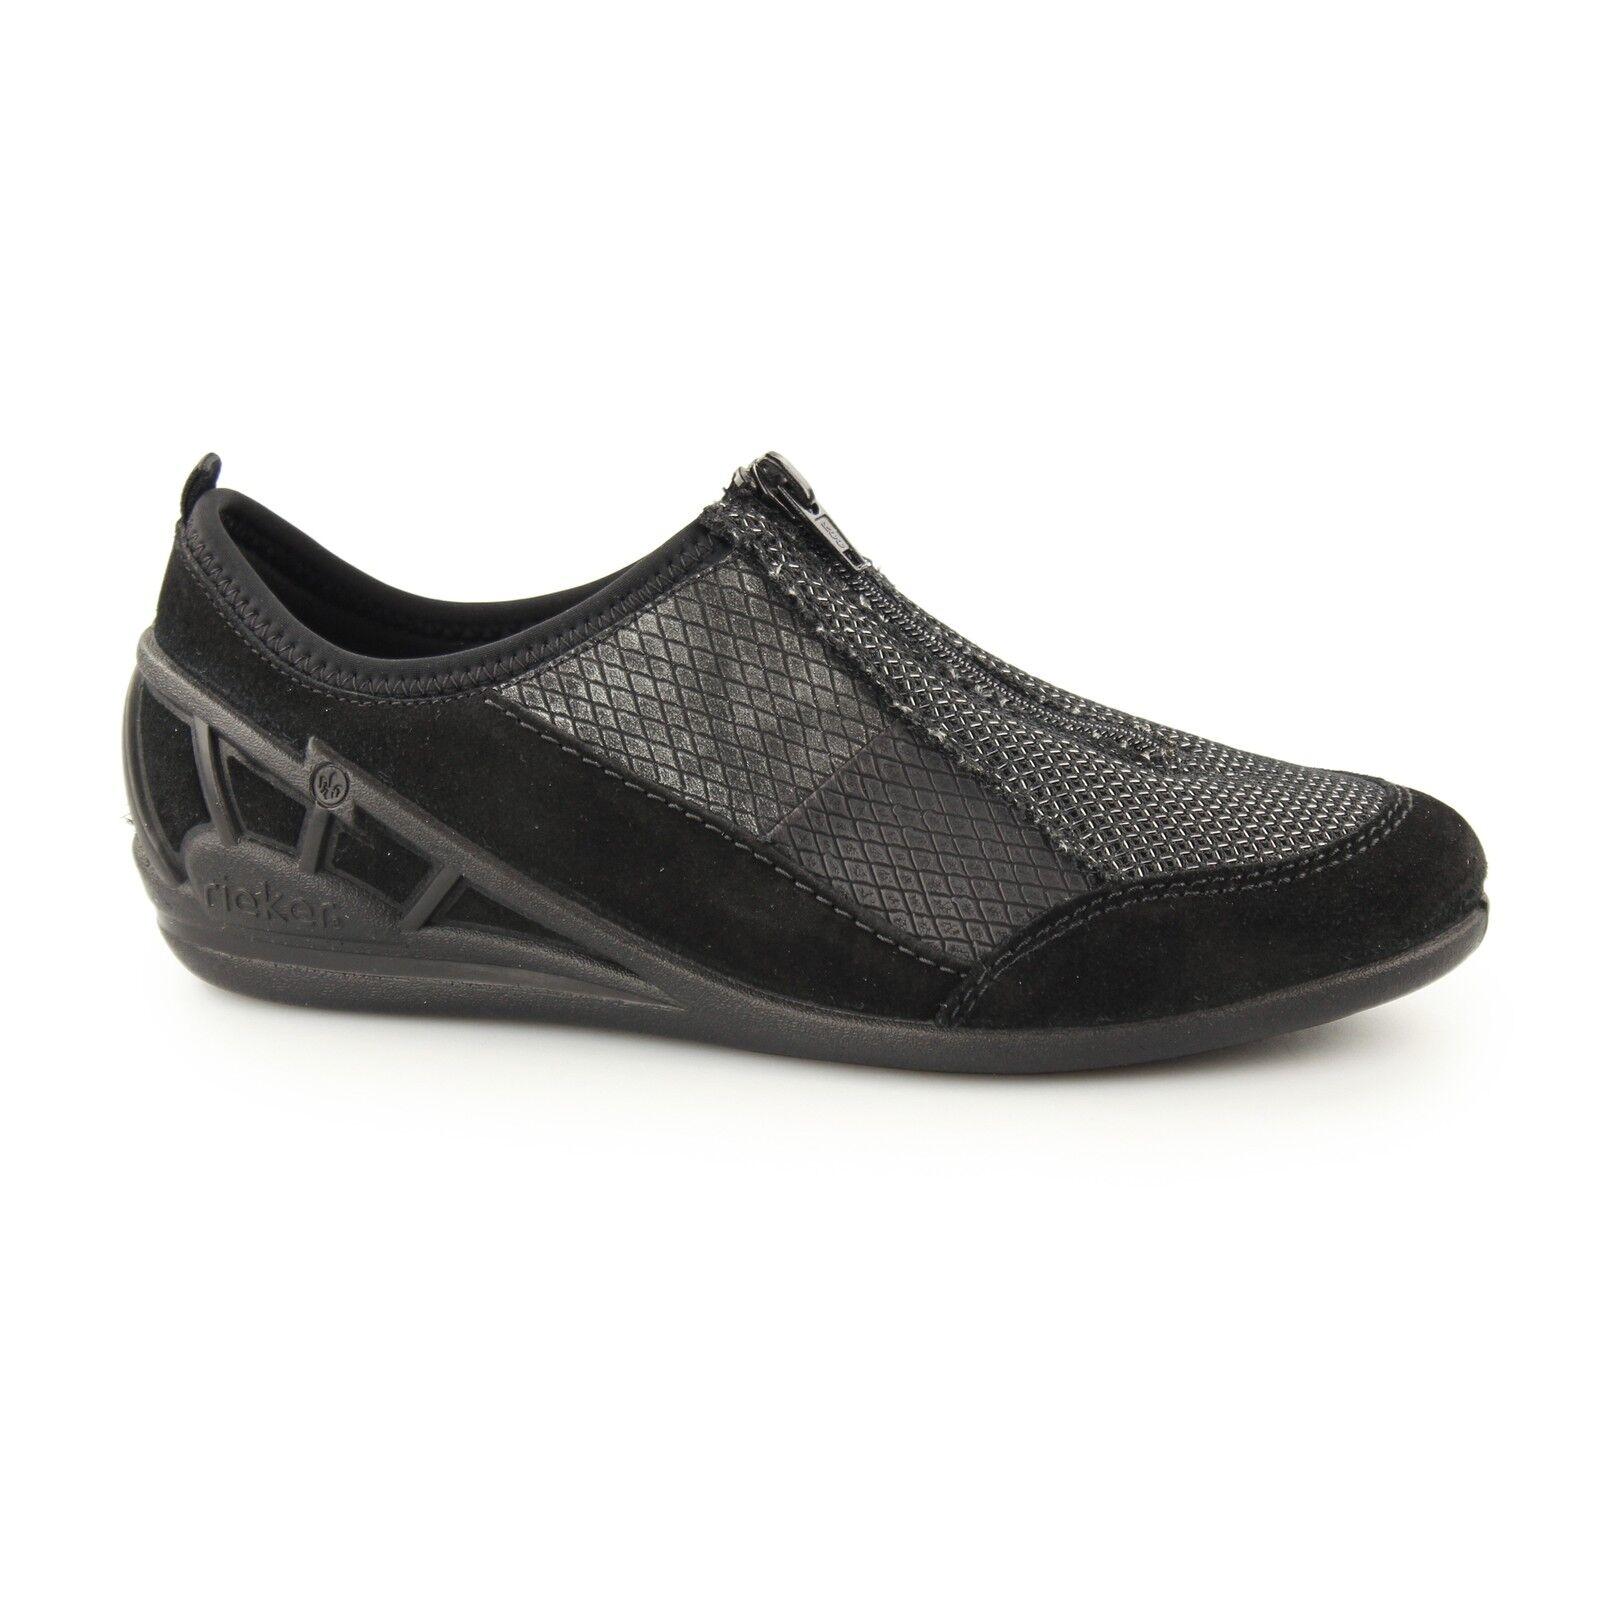 Rieker 59562-00 Ladies Womens Casual Comfort Zip Padded Sporty shoes Black